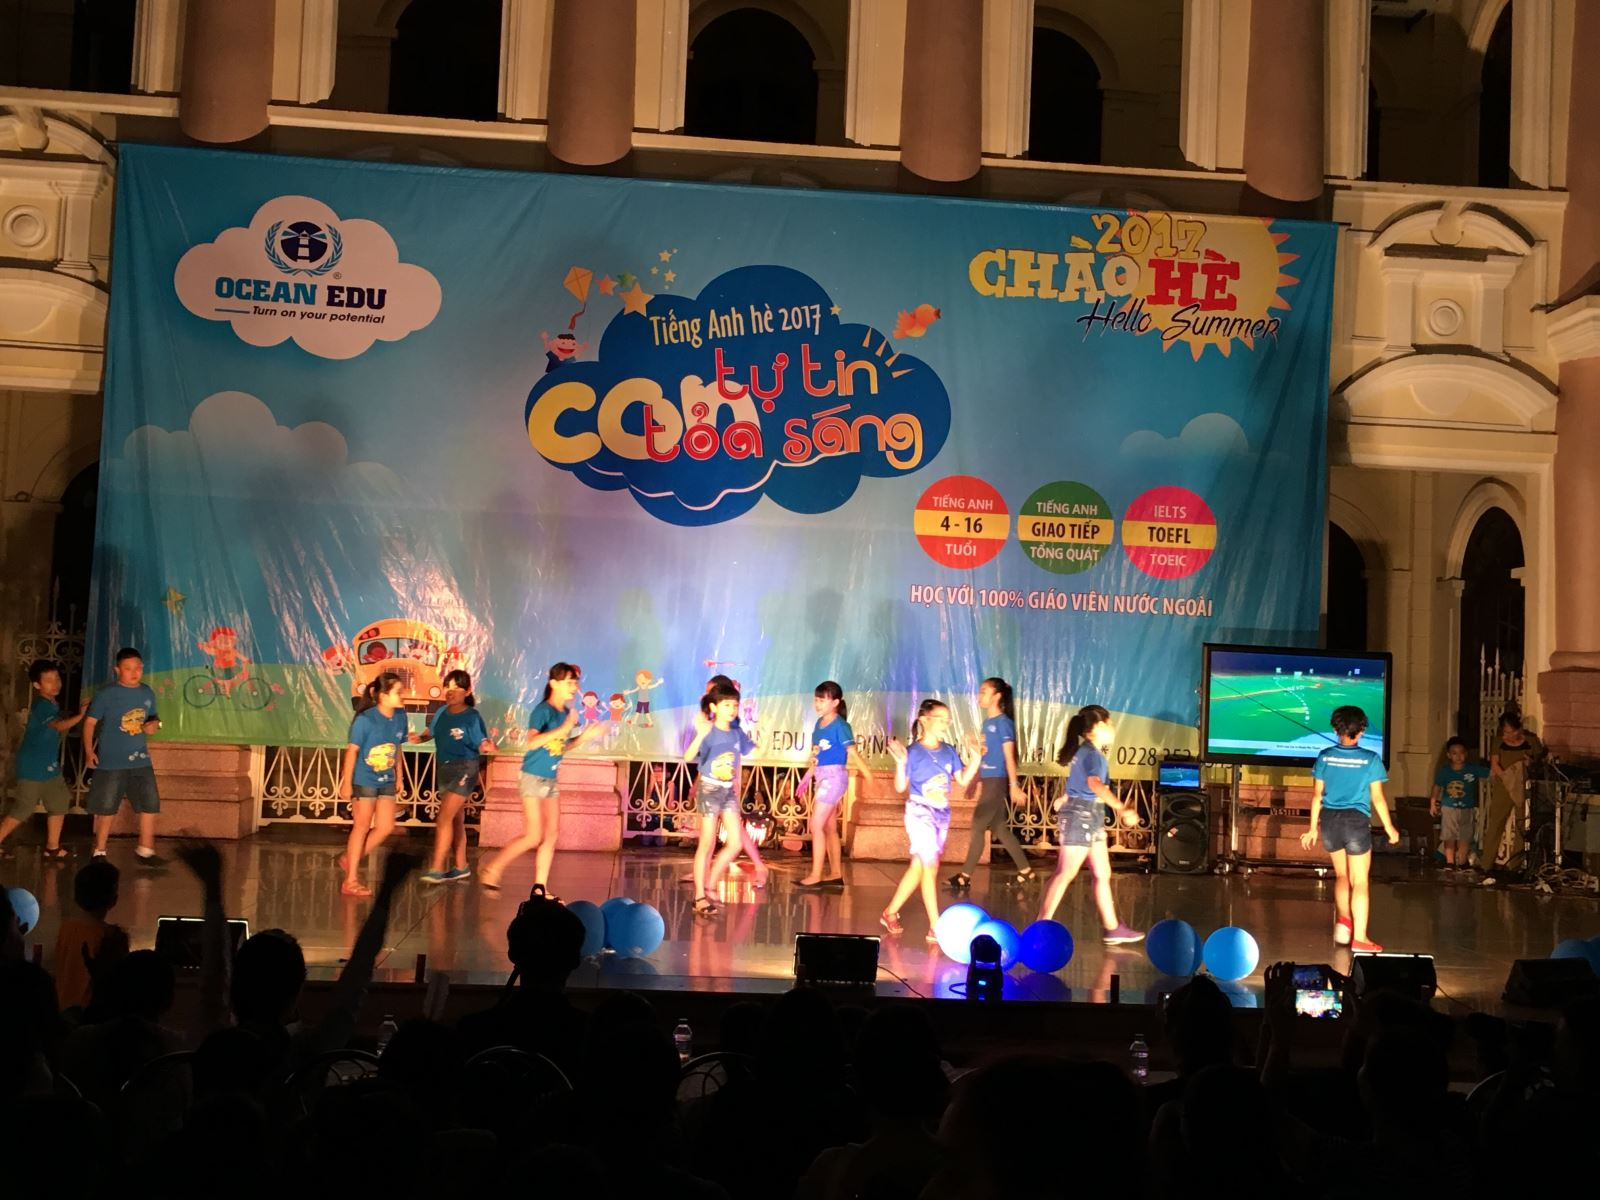 Ocean Edu Nam Định - Đại nhạc hội Hello summer 2017